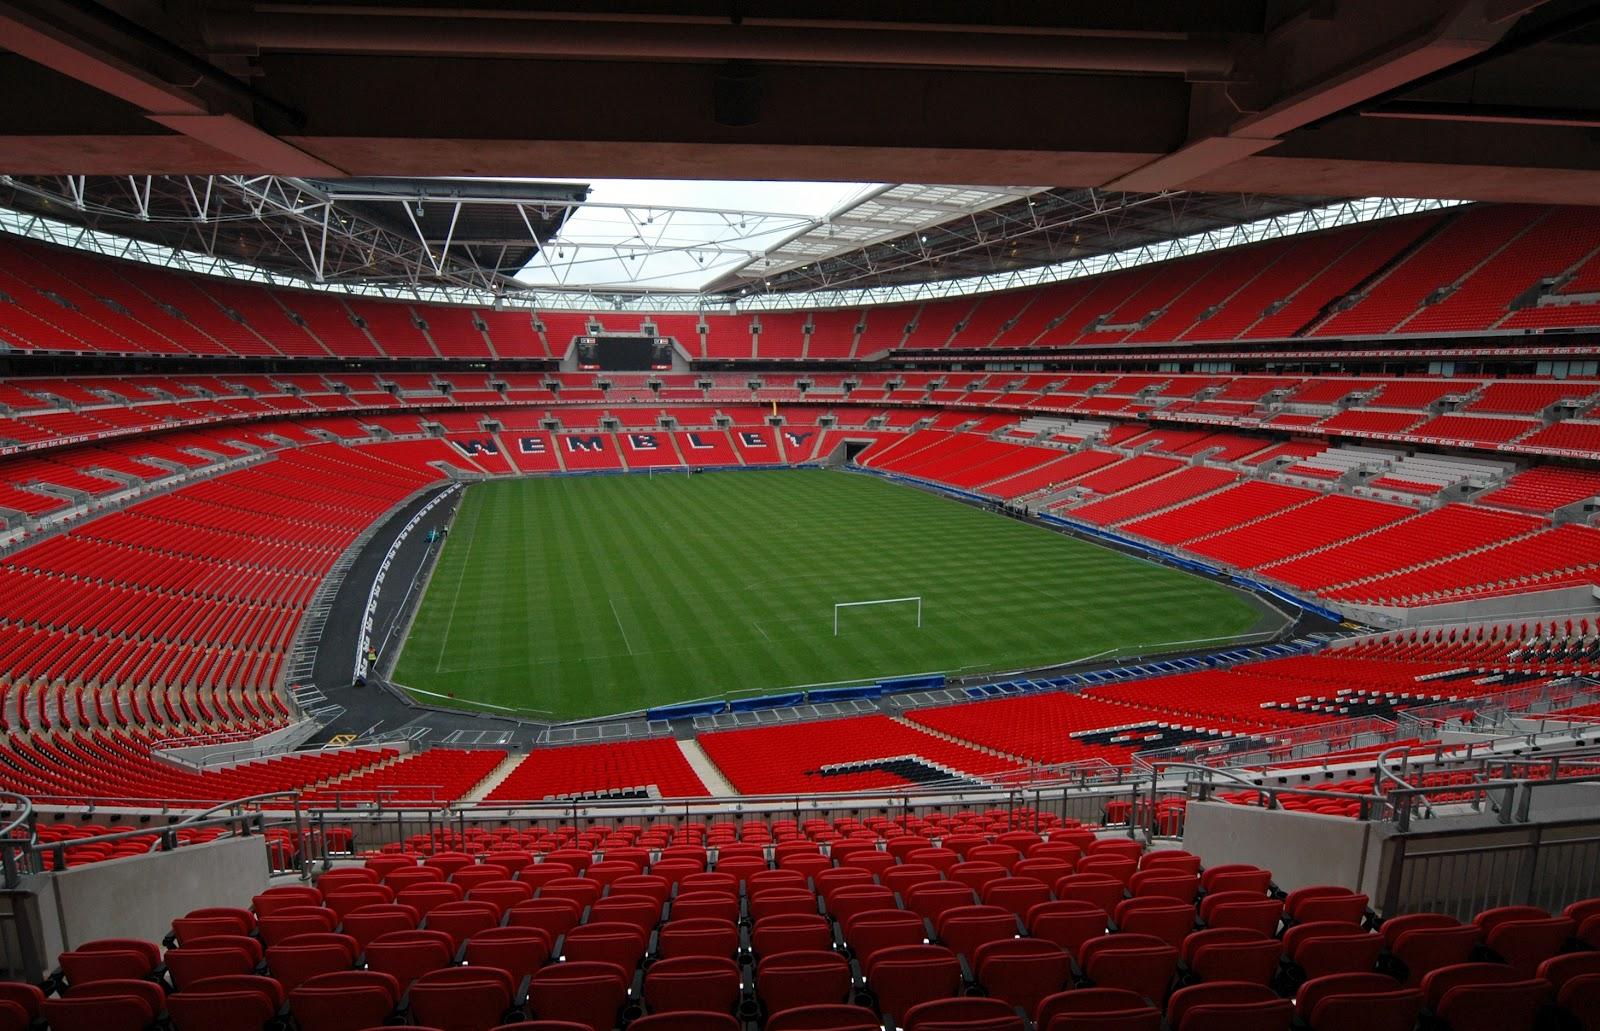 stadium manchester united stadium old trafford old trafford stadium 1600x1031